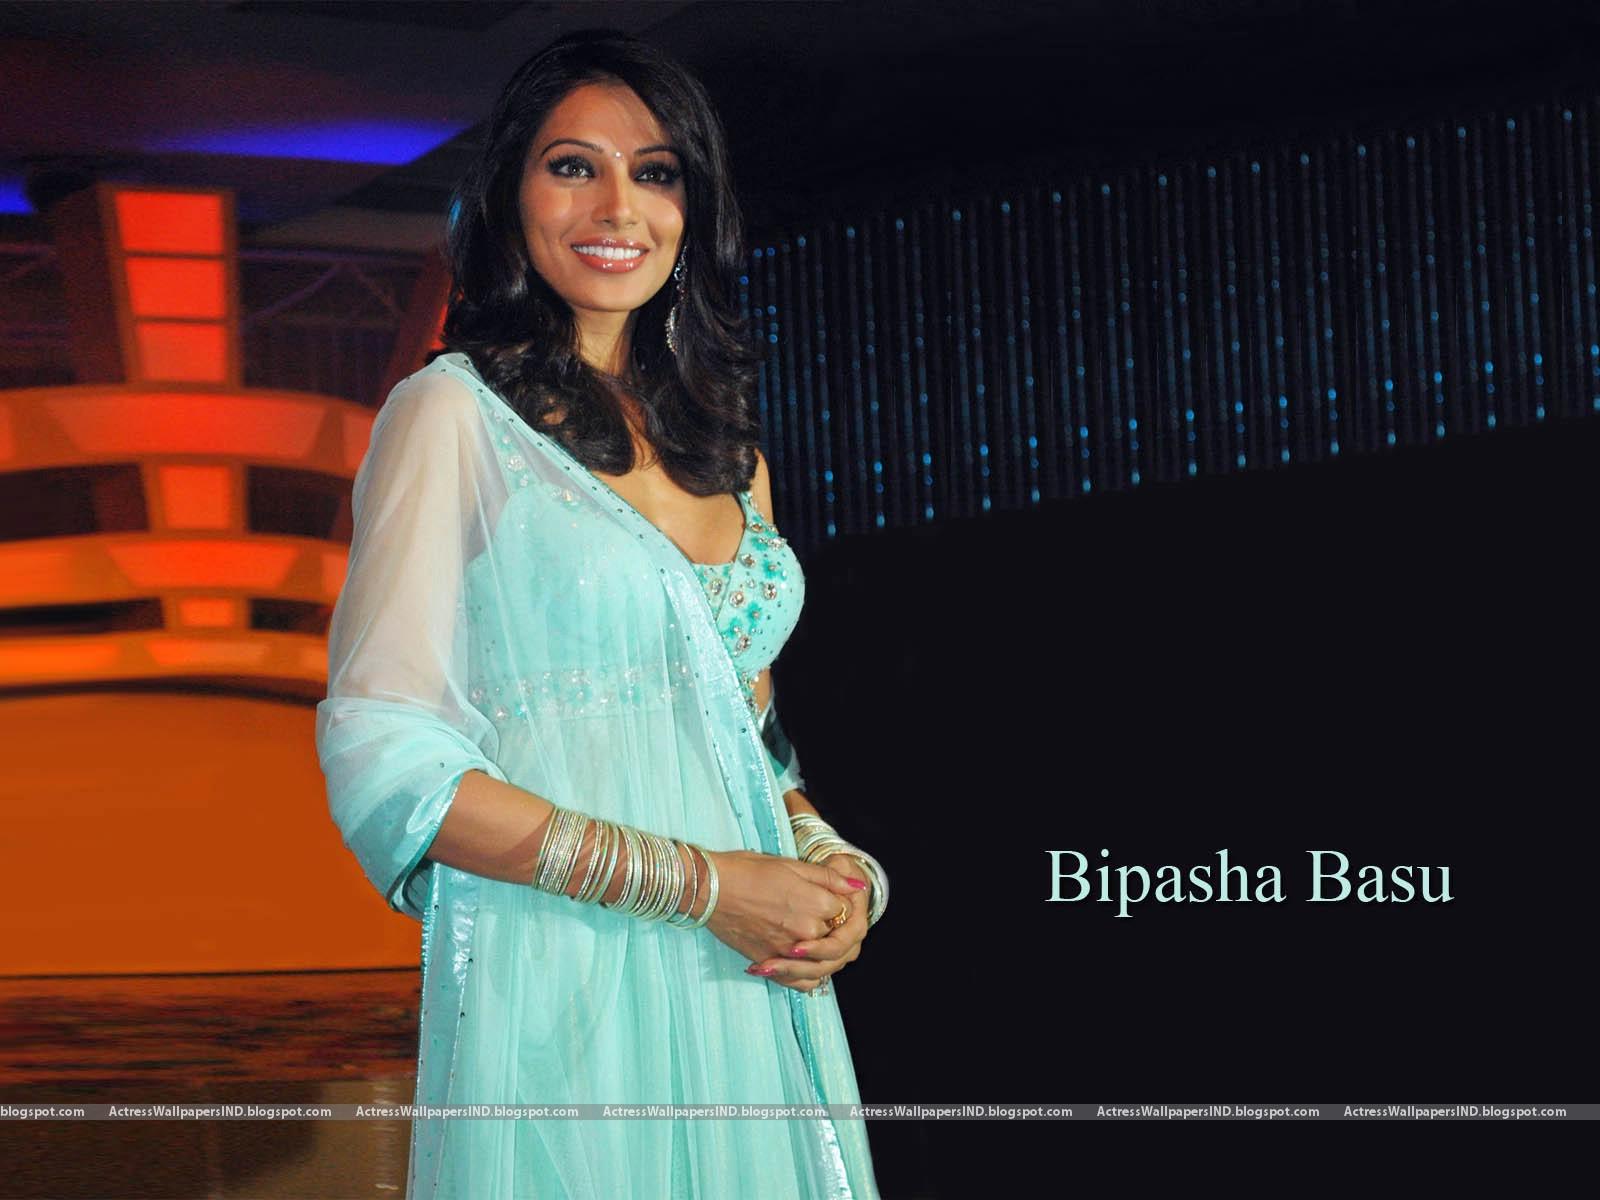 Bipasha Basu Hot Seen Photos - A Wind-3317